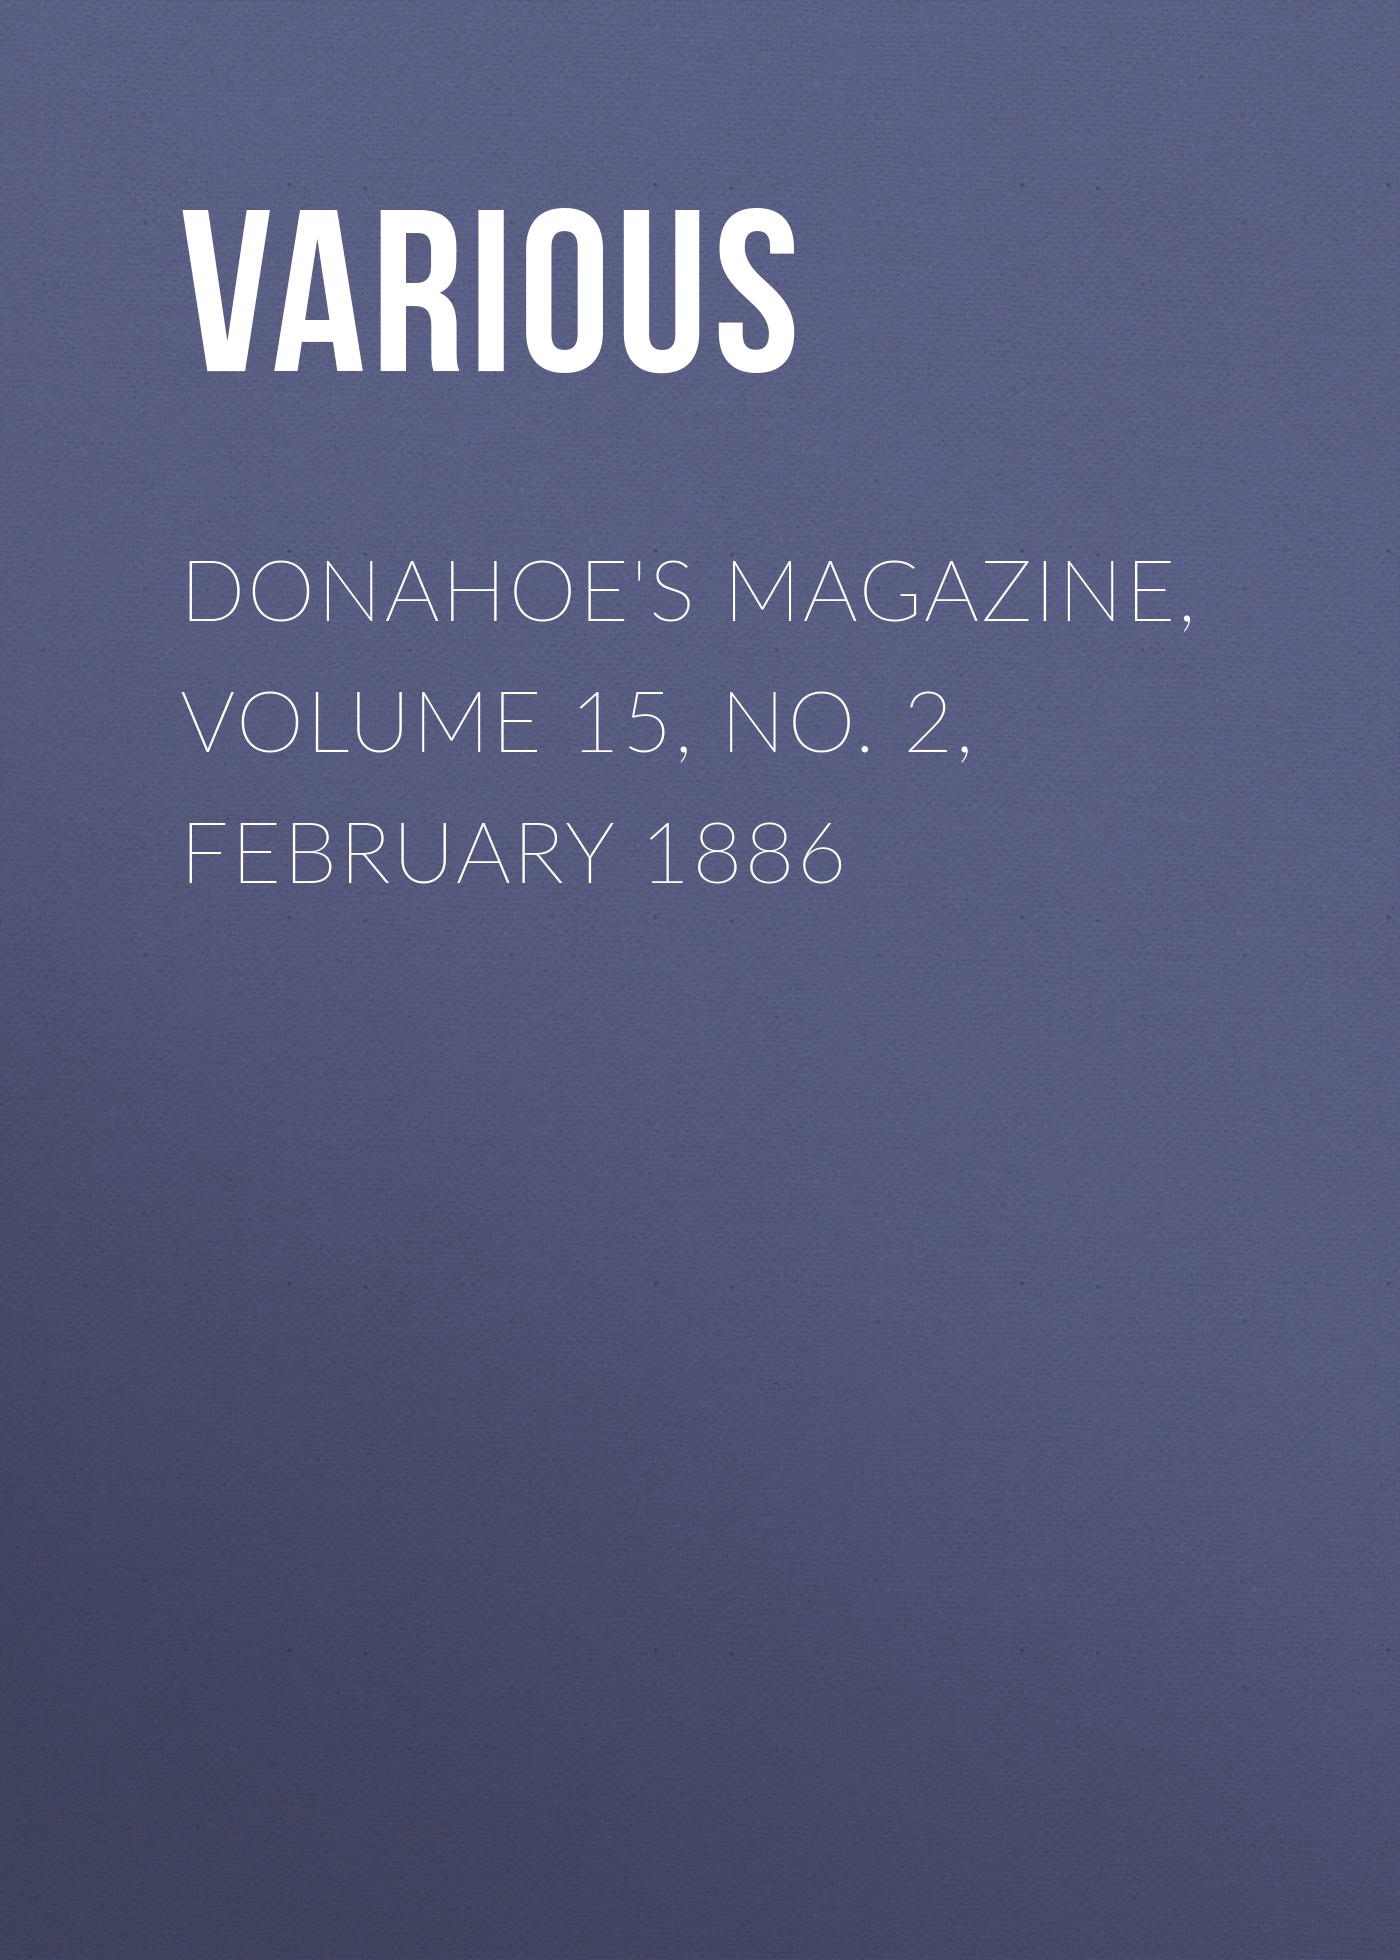 Various Donahoe's Magazine, Volume 15, No. 2, February 1886 various donahoe s magazine volume 15 no 4 april 1886